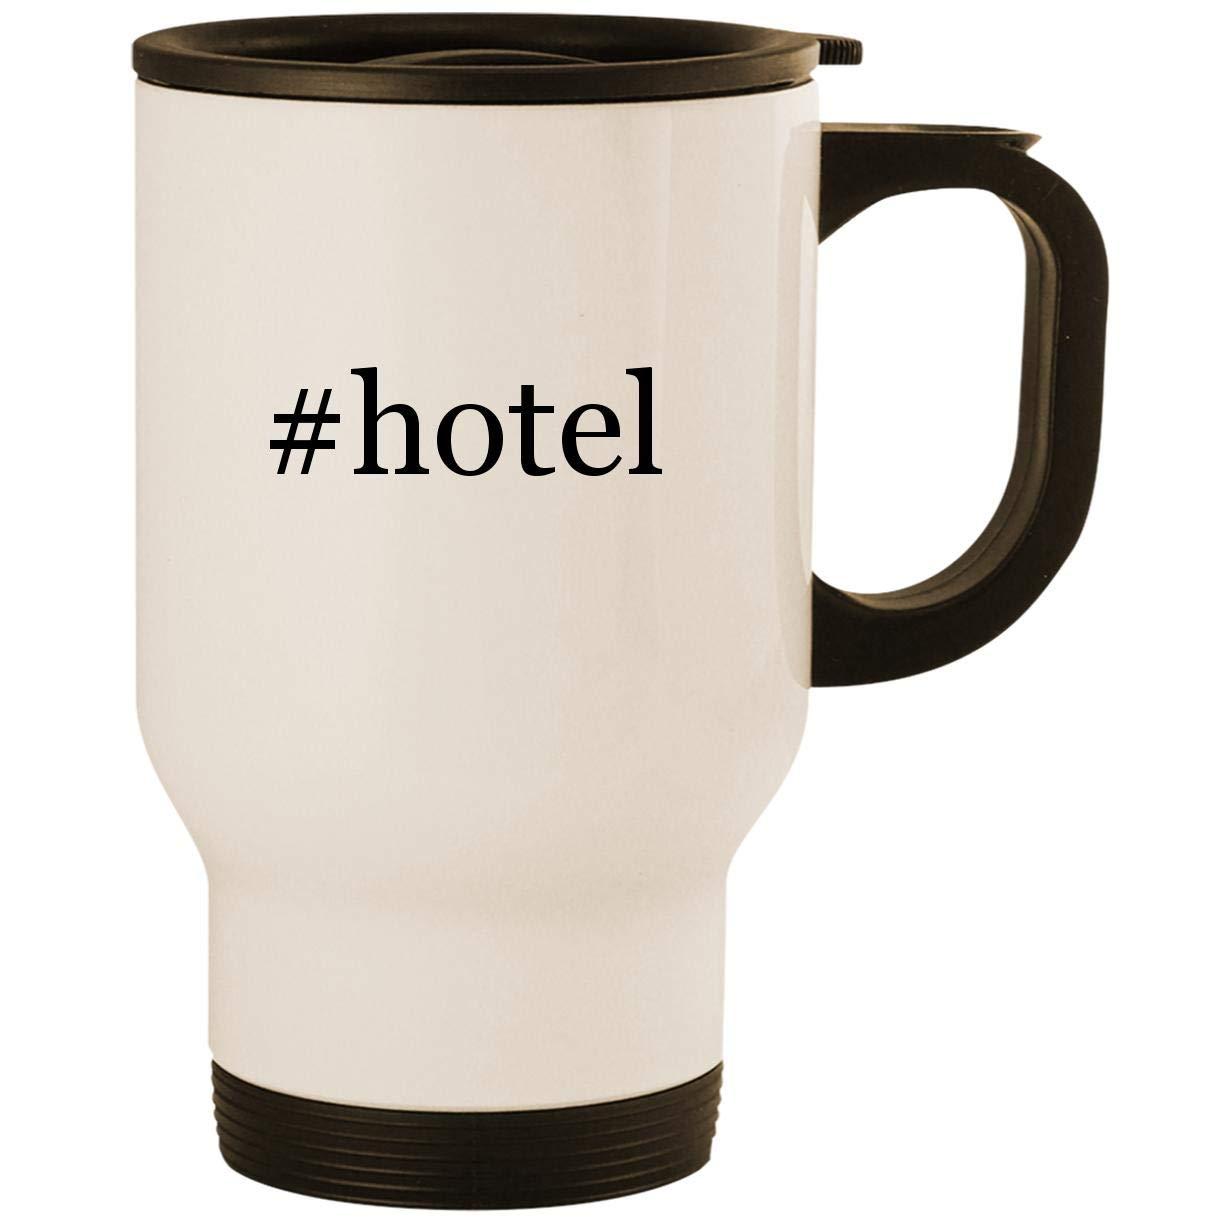 #hotel - Stainless Steel 14oz Road Ready Travel Mug, White